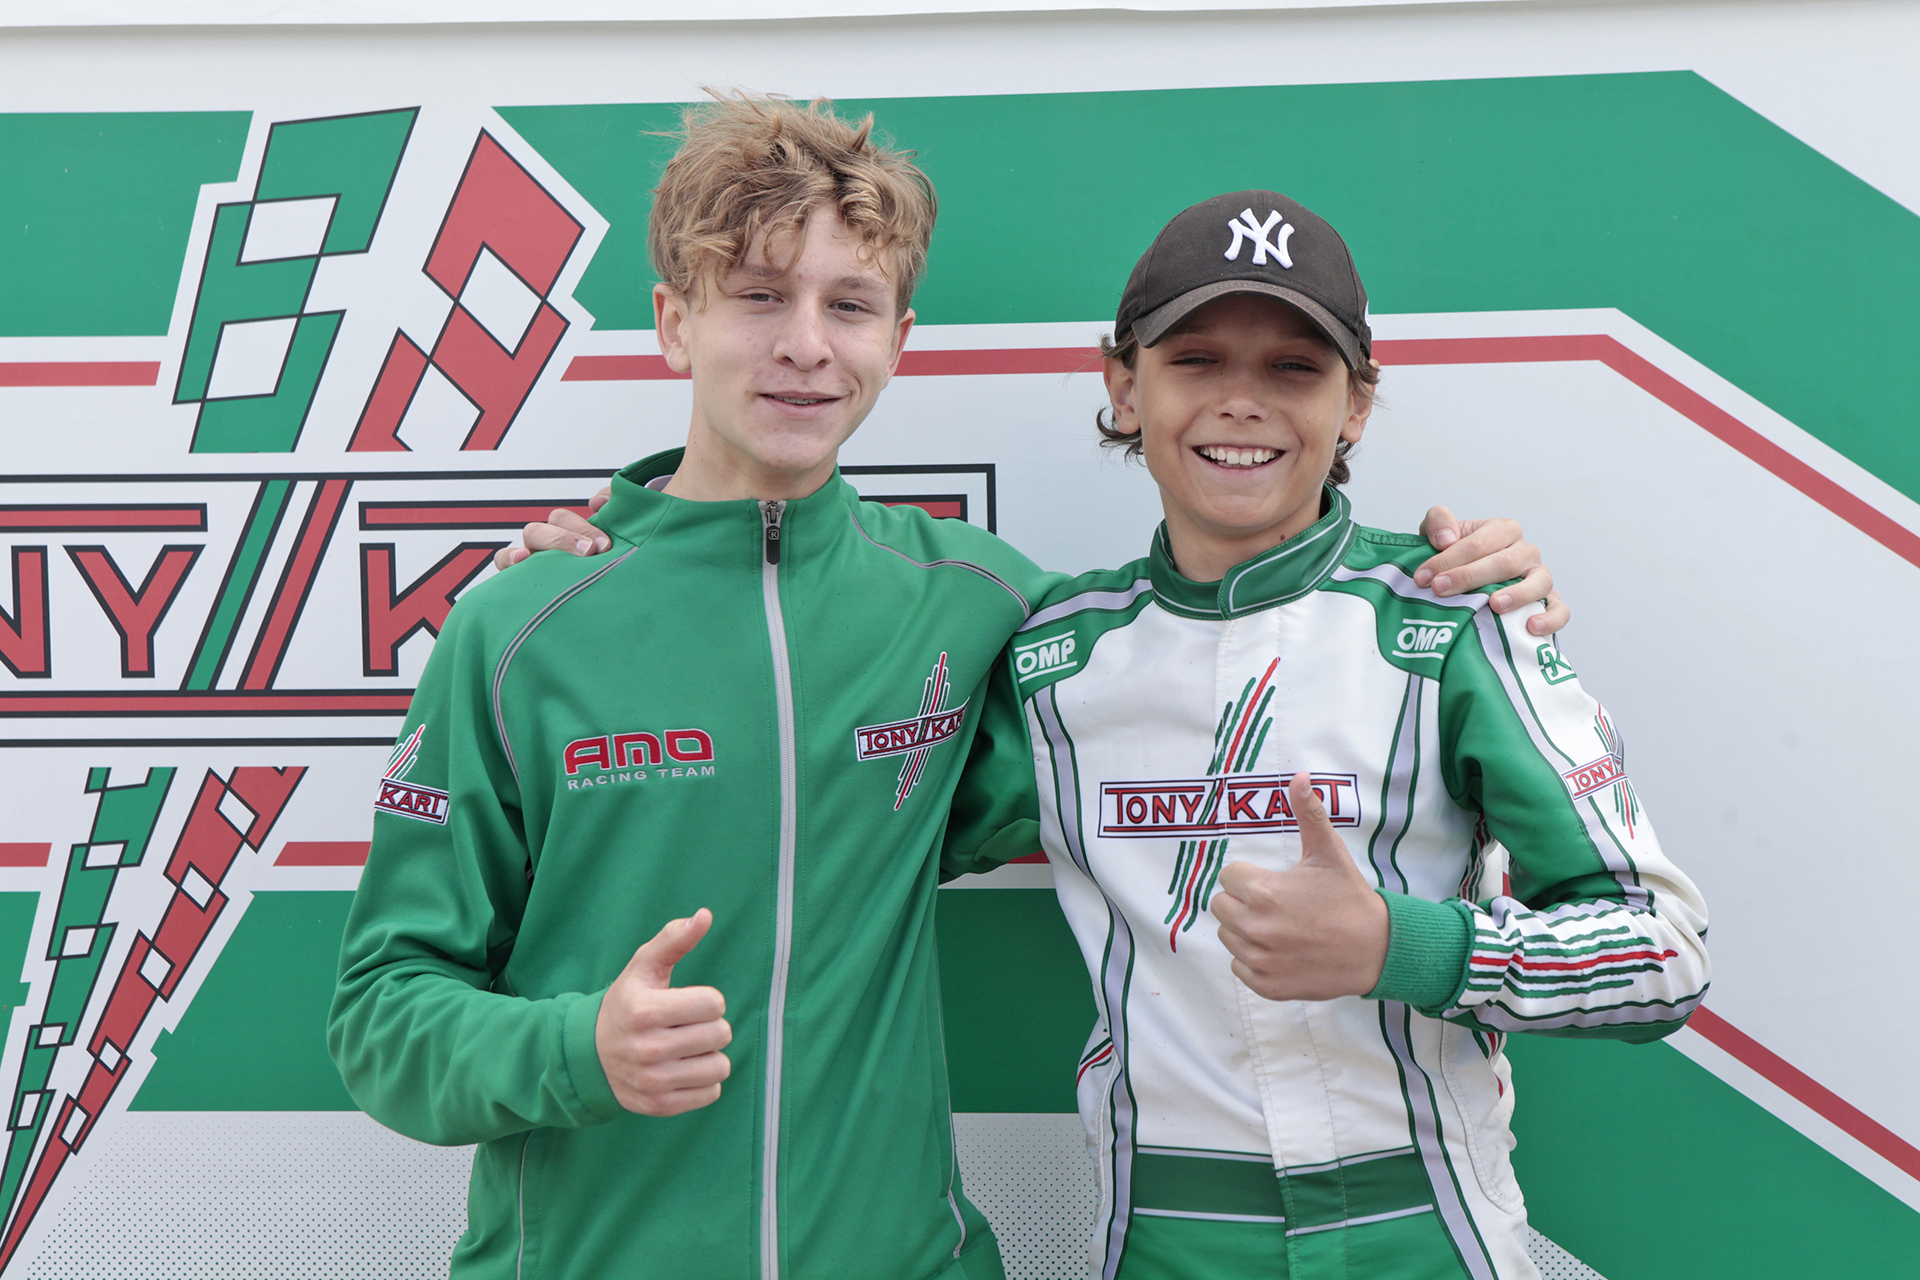 AMO Racing Team - team kartingowy, profesjonalne zawody kartingowe